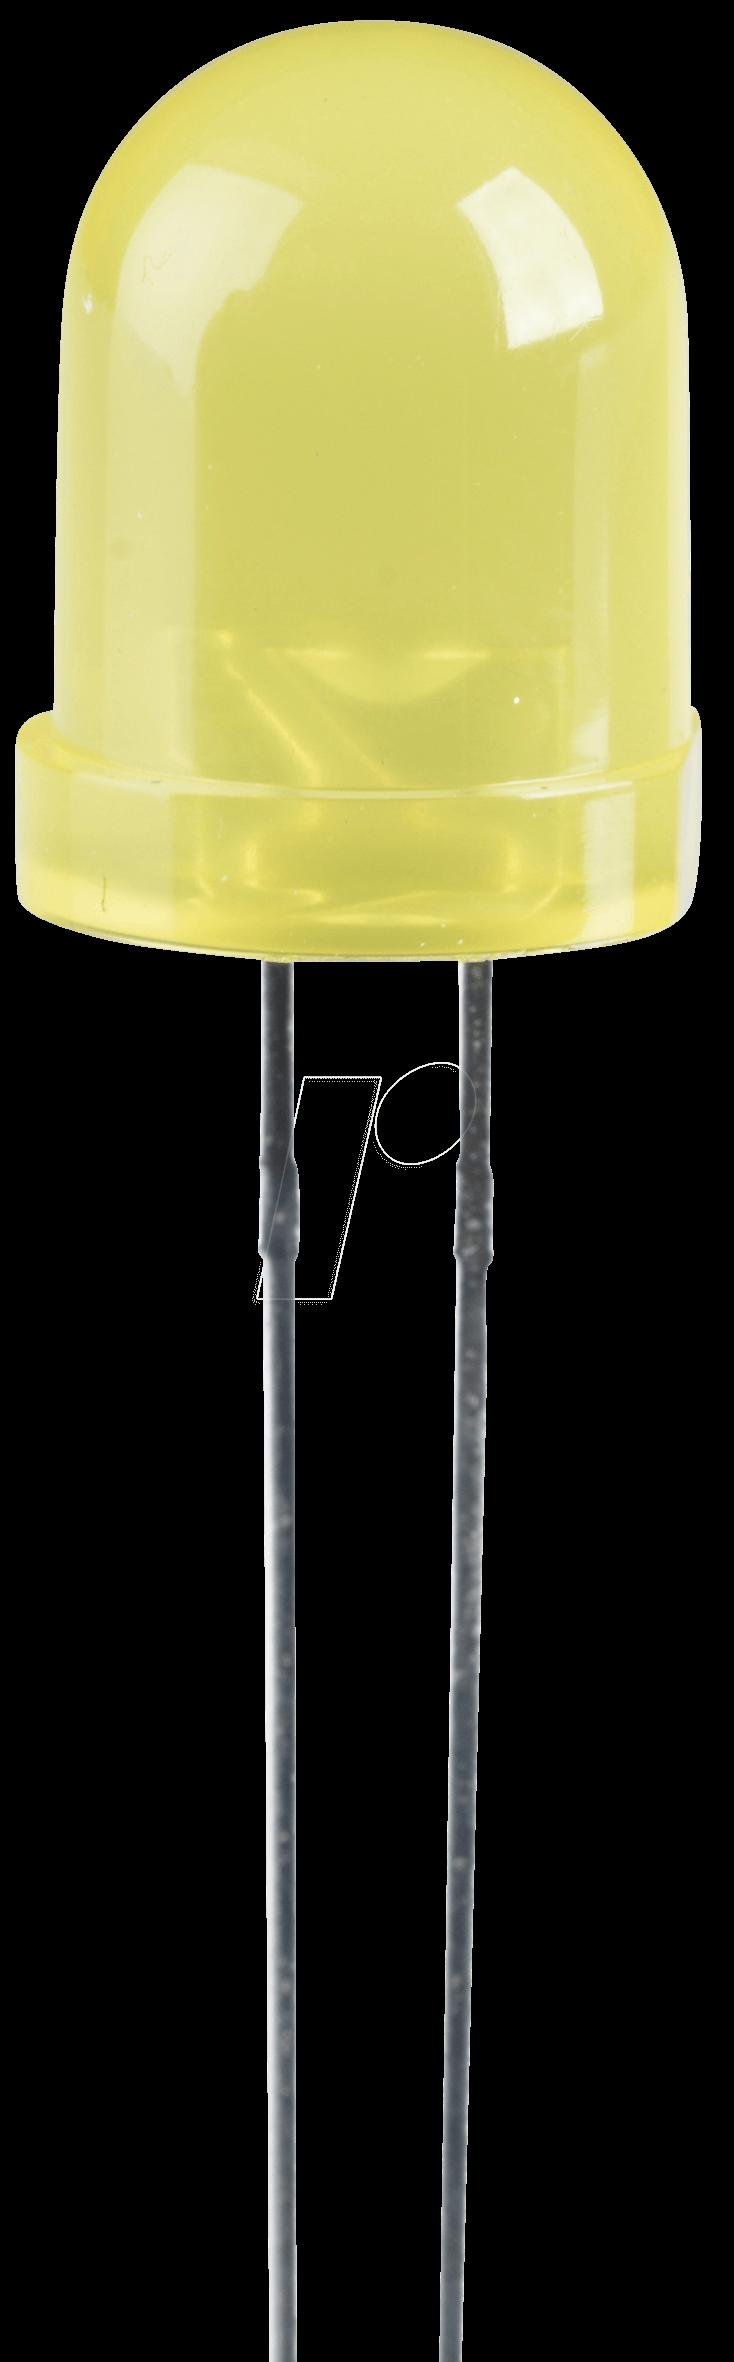 LED 8MM GE - LED, 8 mm, bedrahtet, gelb, 70 mcd, 50°